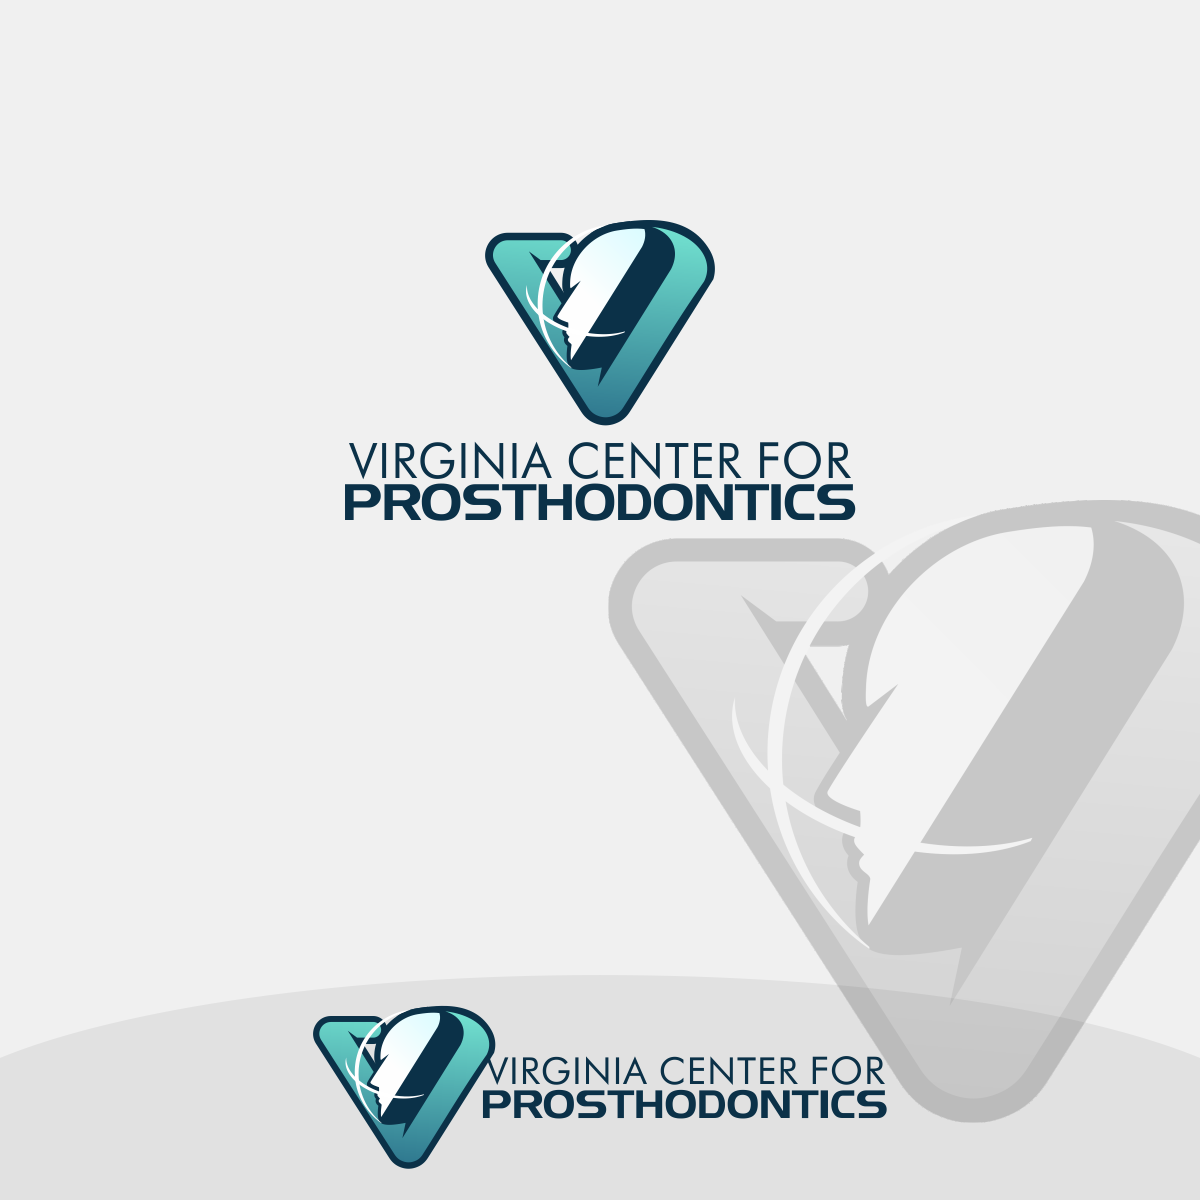 Logo Design by Private User - Entry No. 40 in the Logo Design Contest Imaginative Logo Design for Virginia Center for Prosthodontics.